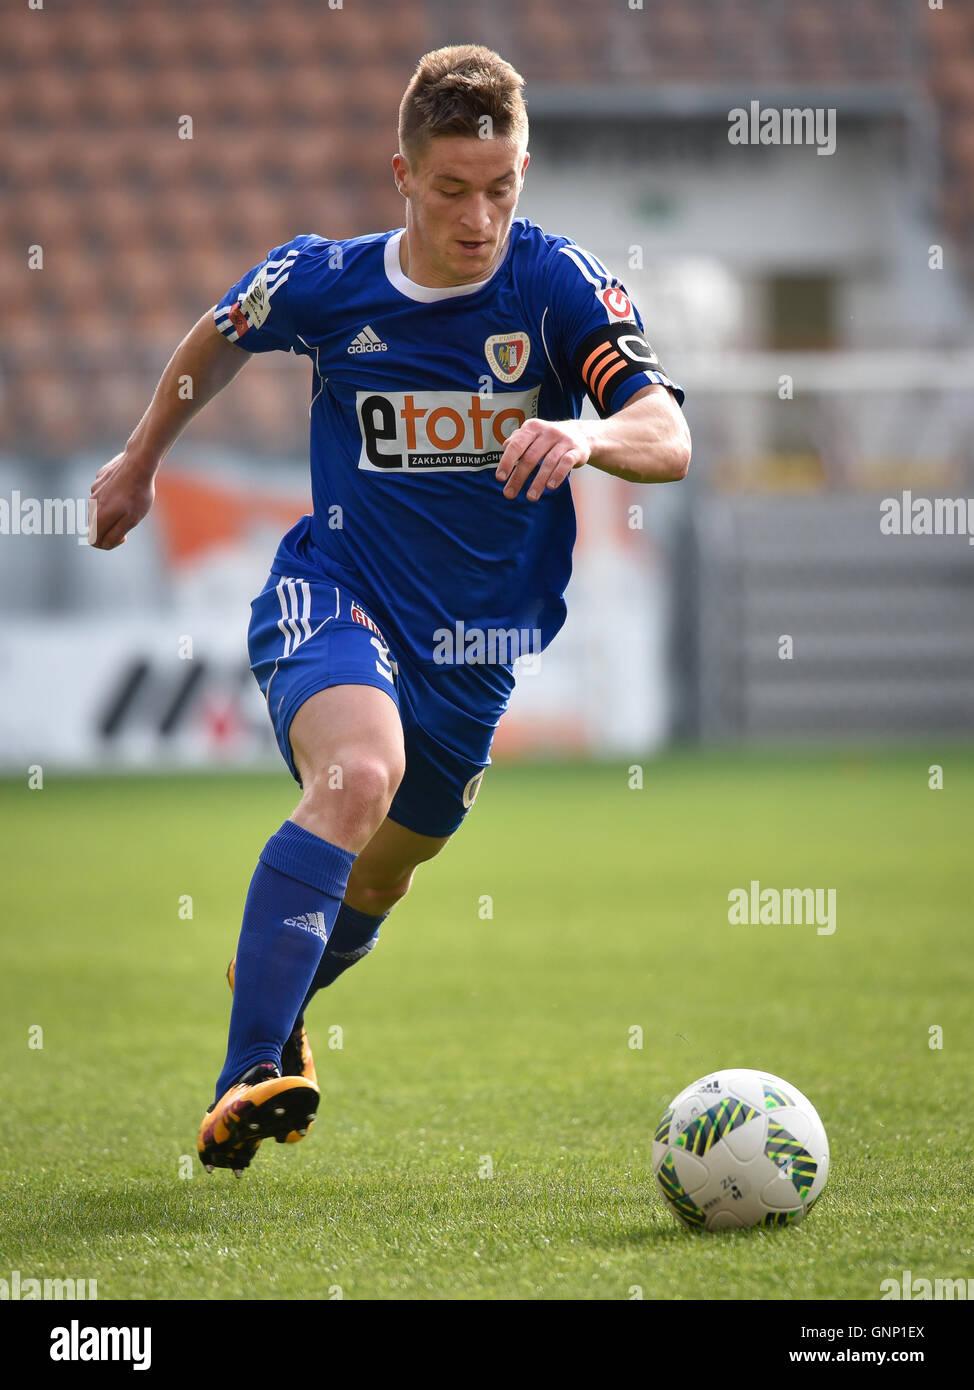 LUBIN, POLAND - APRIL 3, 2016: Radoslaw Murawski in action during match Polish Premer League KGHM Zaglebie Lubin - Stock Image